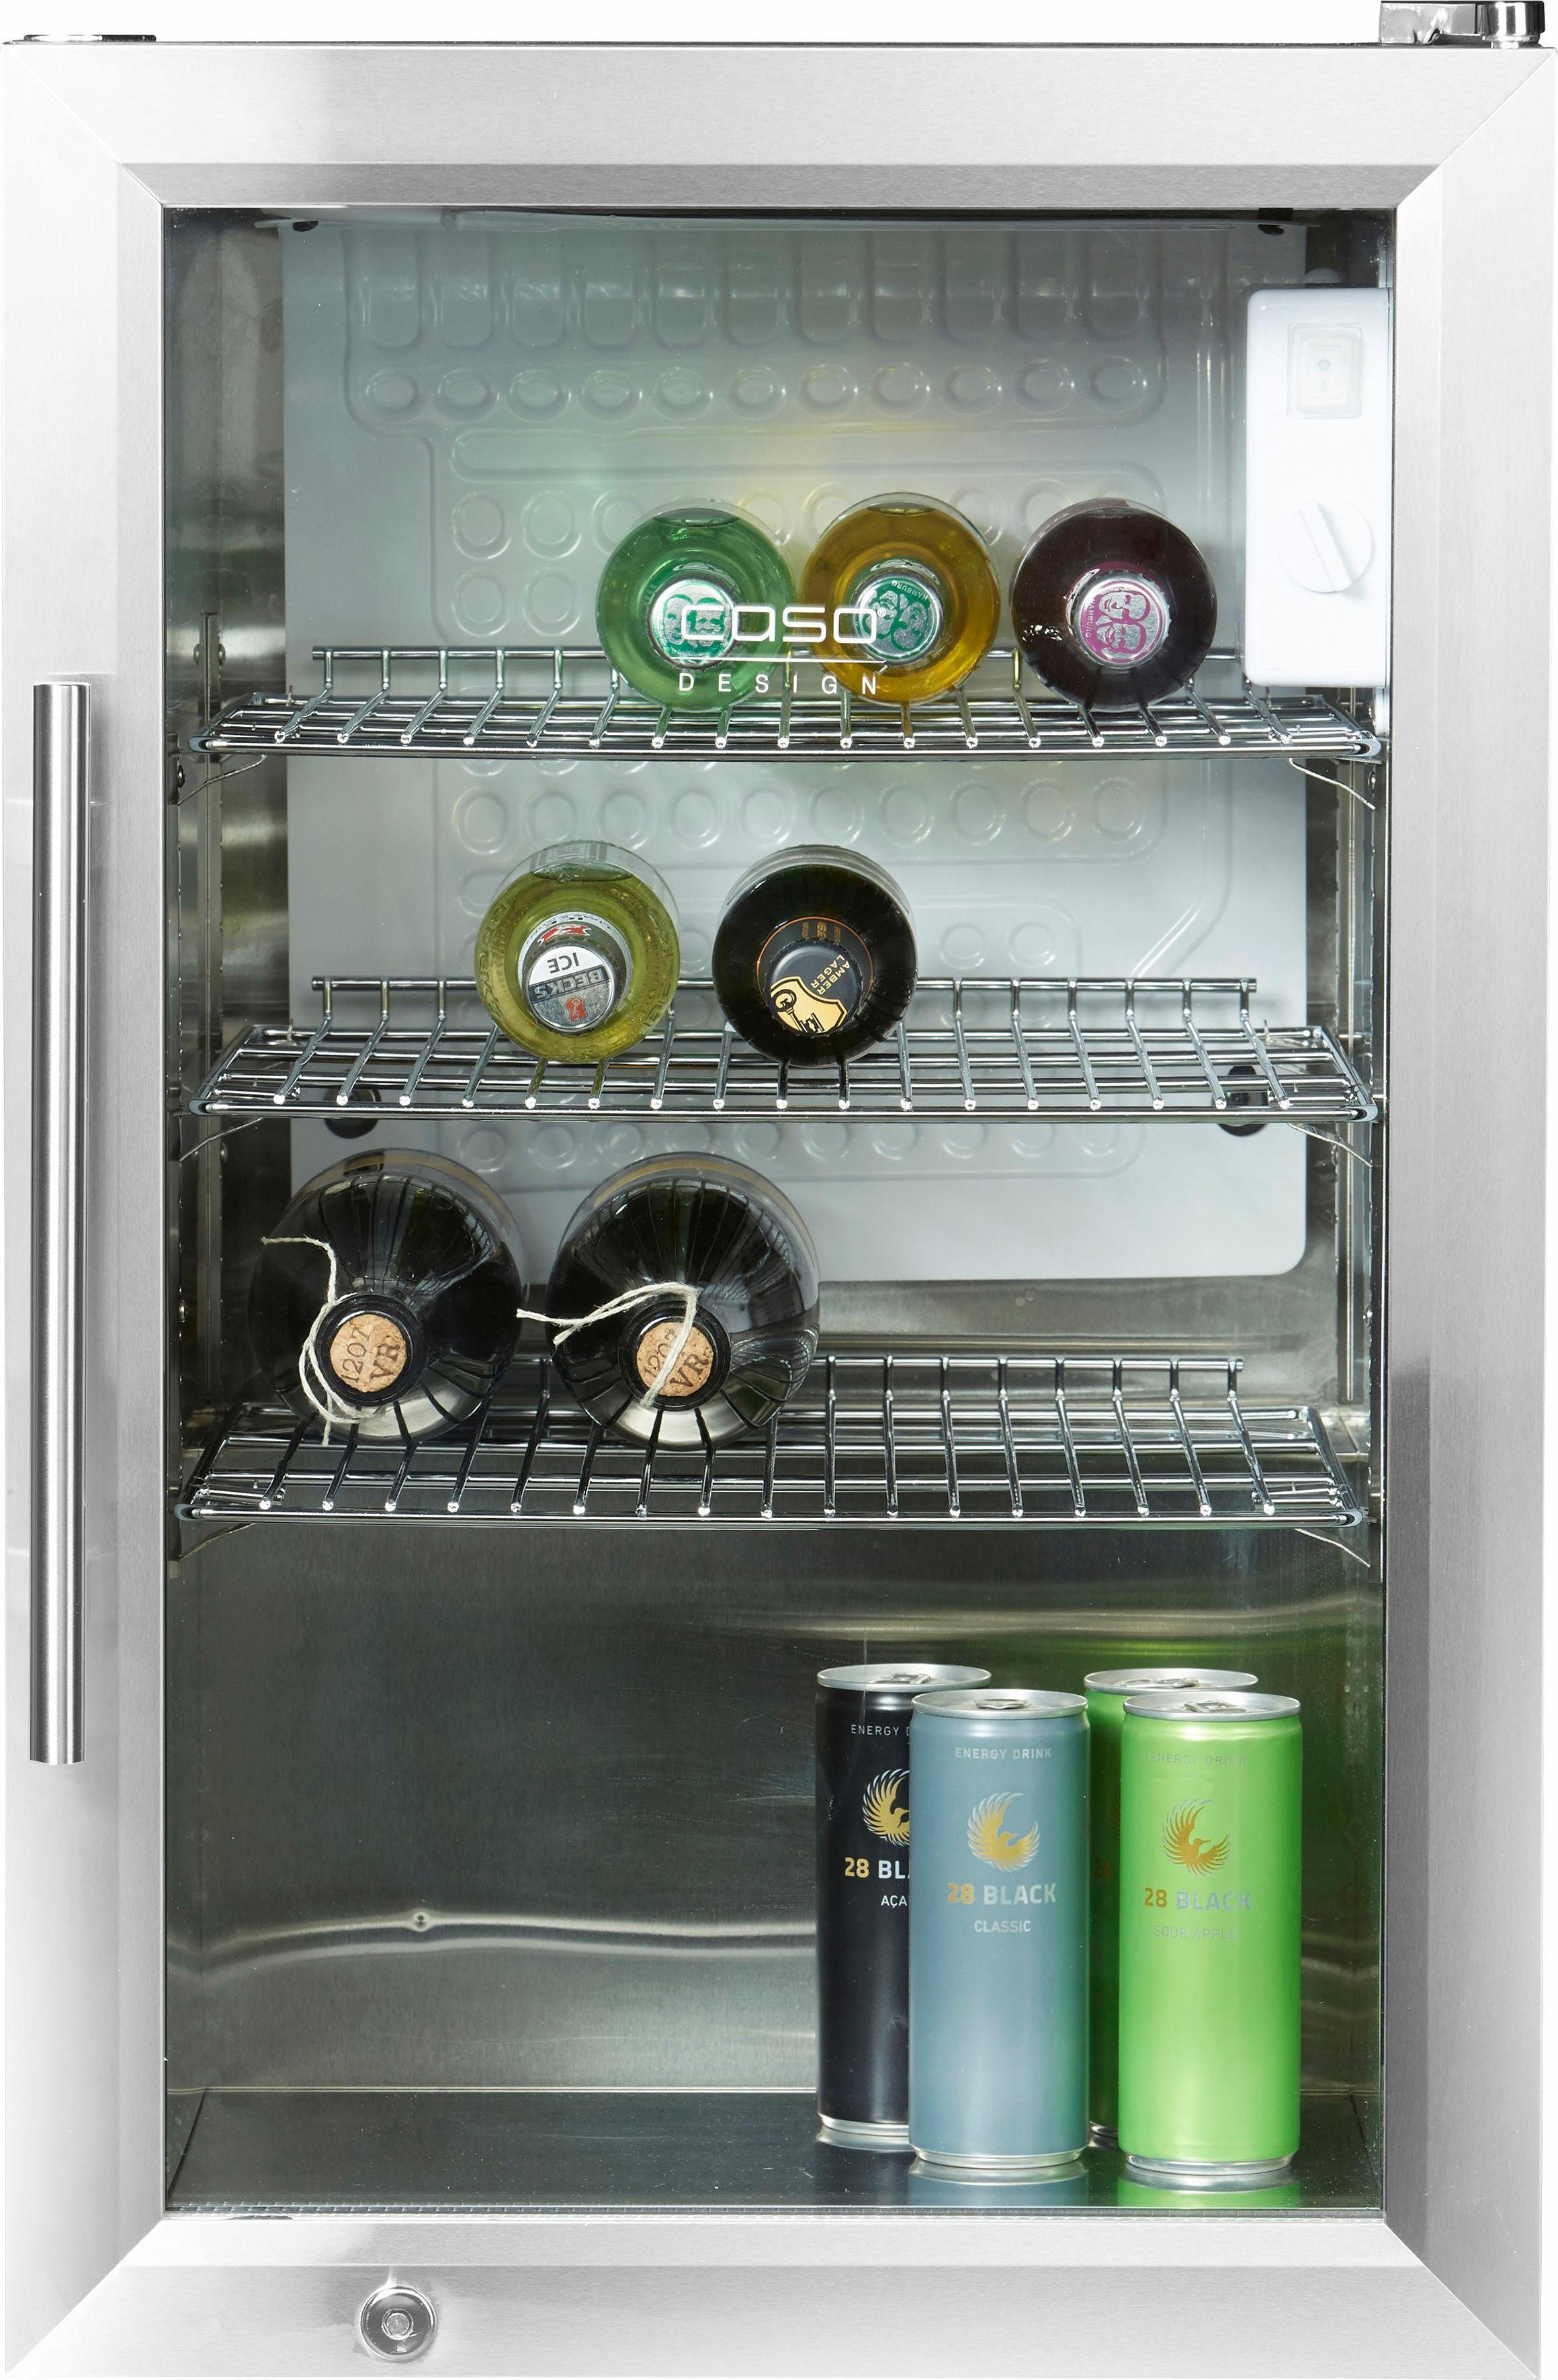 CASO Design Barbecue Cooler, A, 69 cm hoch